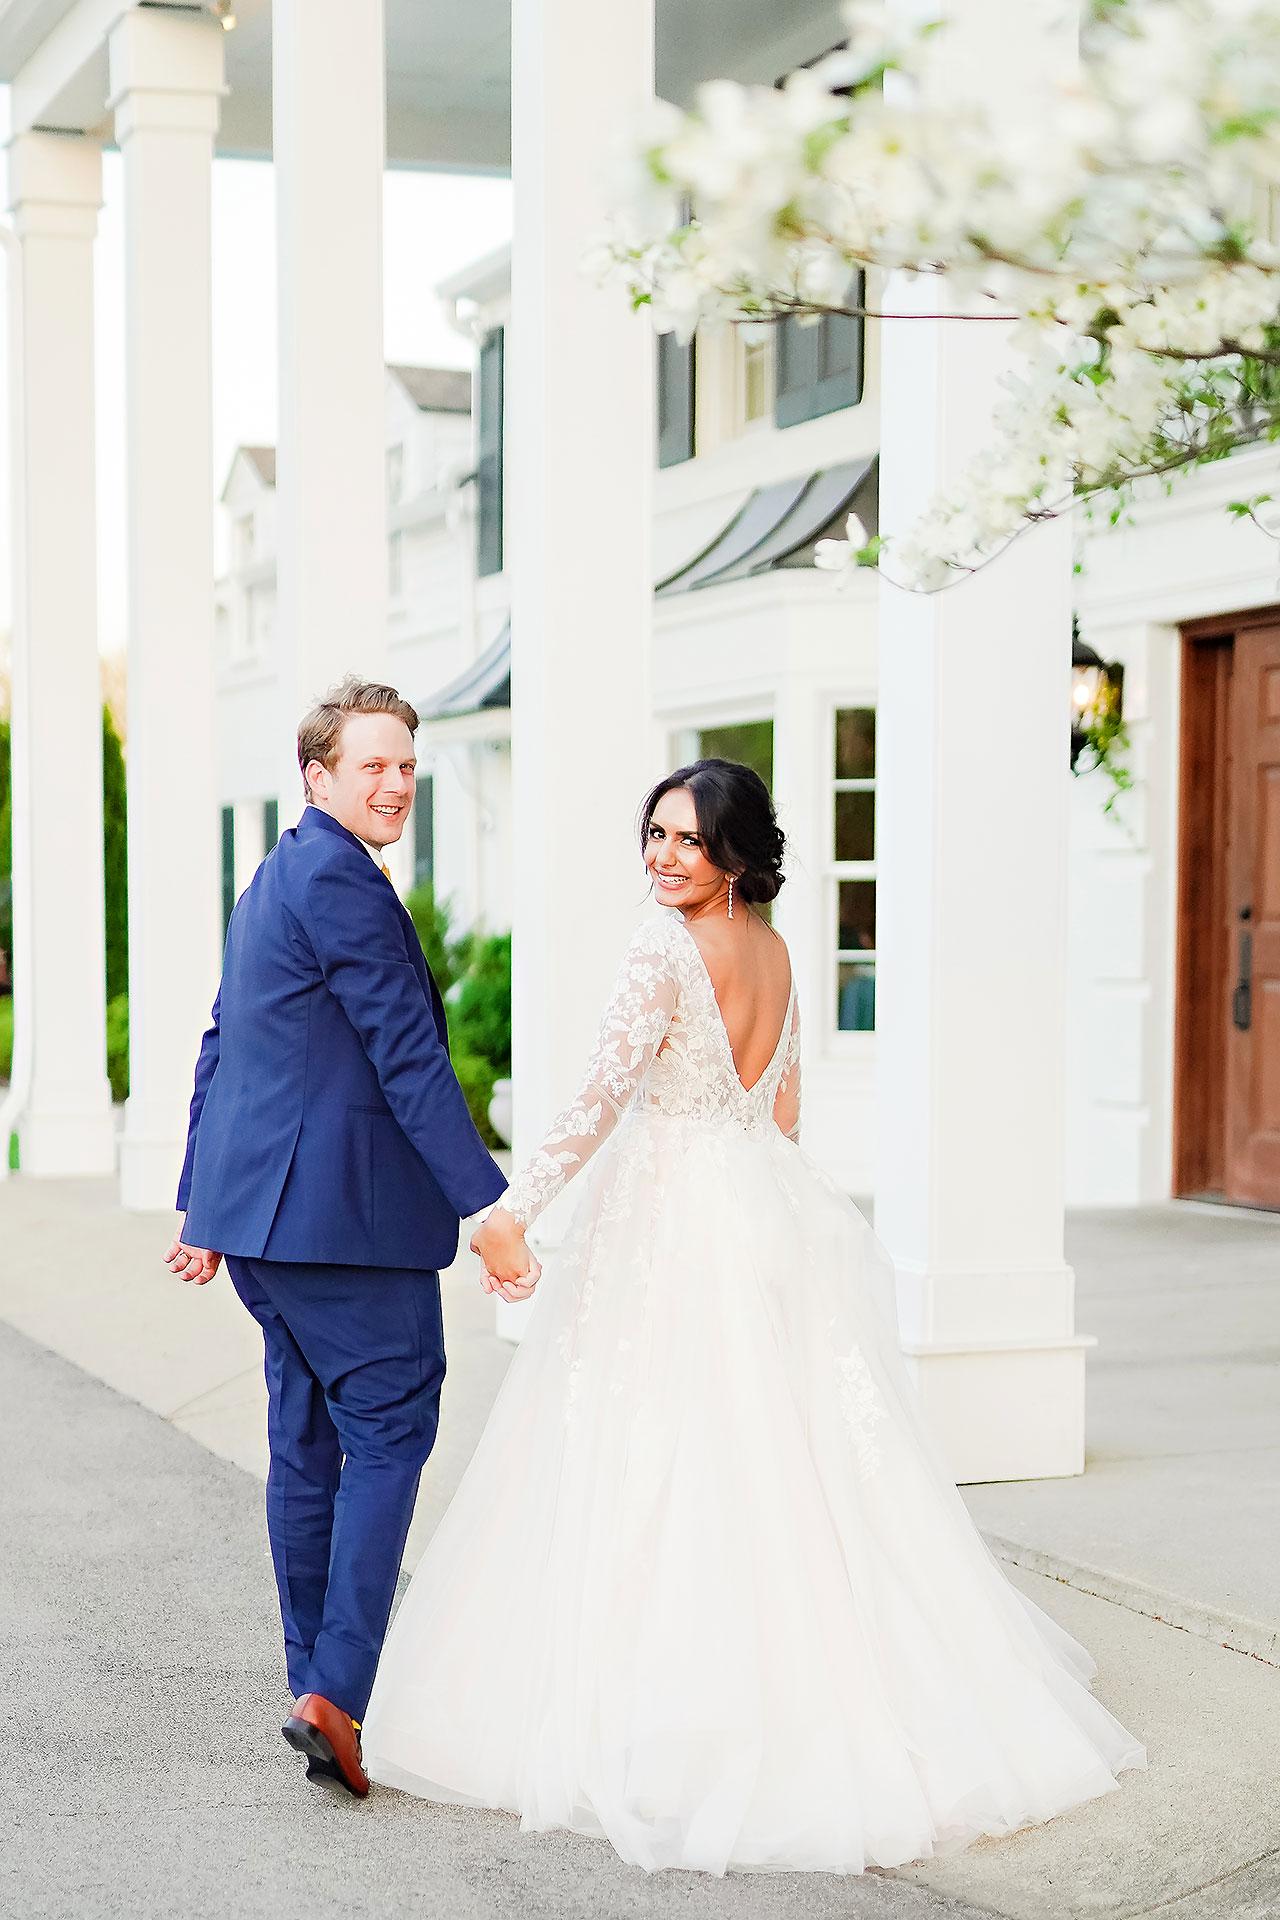 Nadia Parker Black Iris Estate Carmel Indiana Wedding May 2021 282